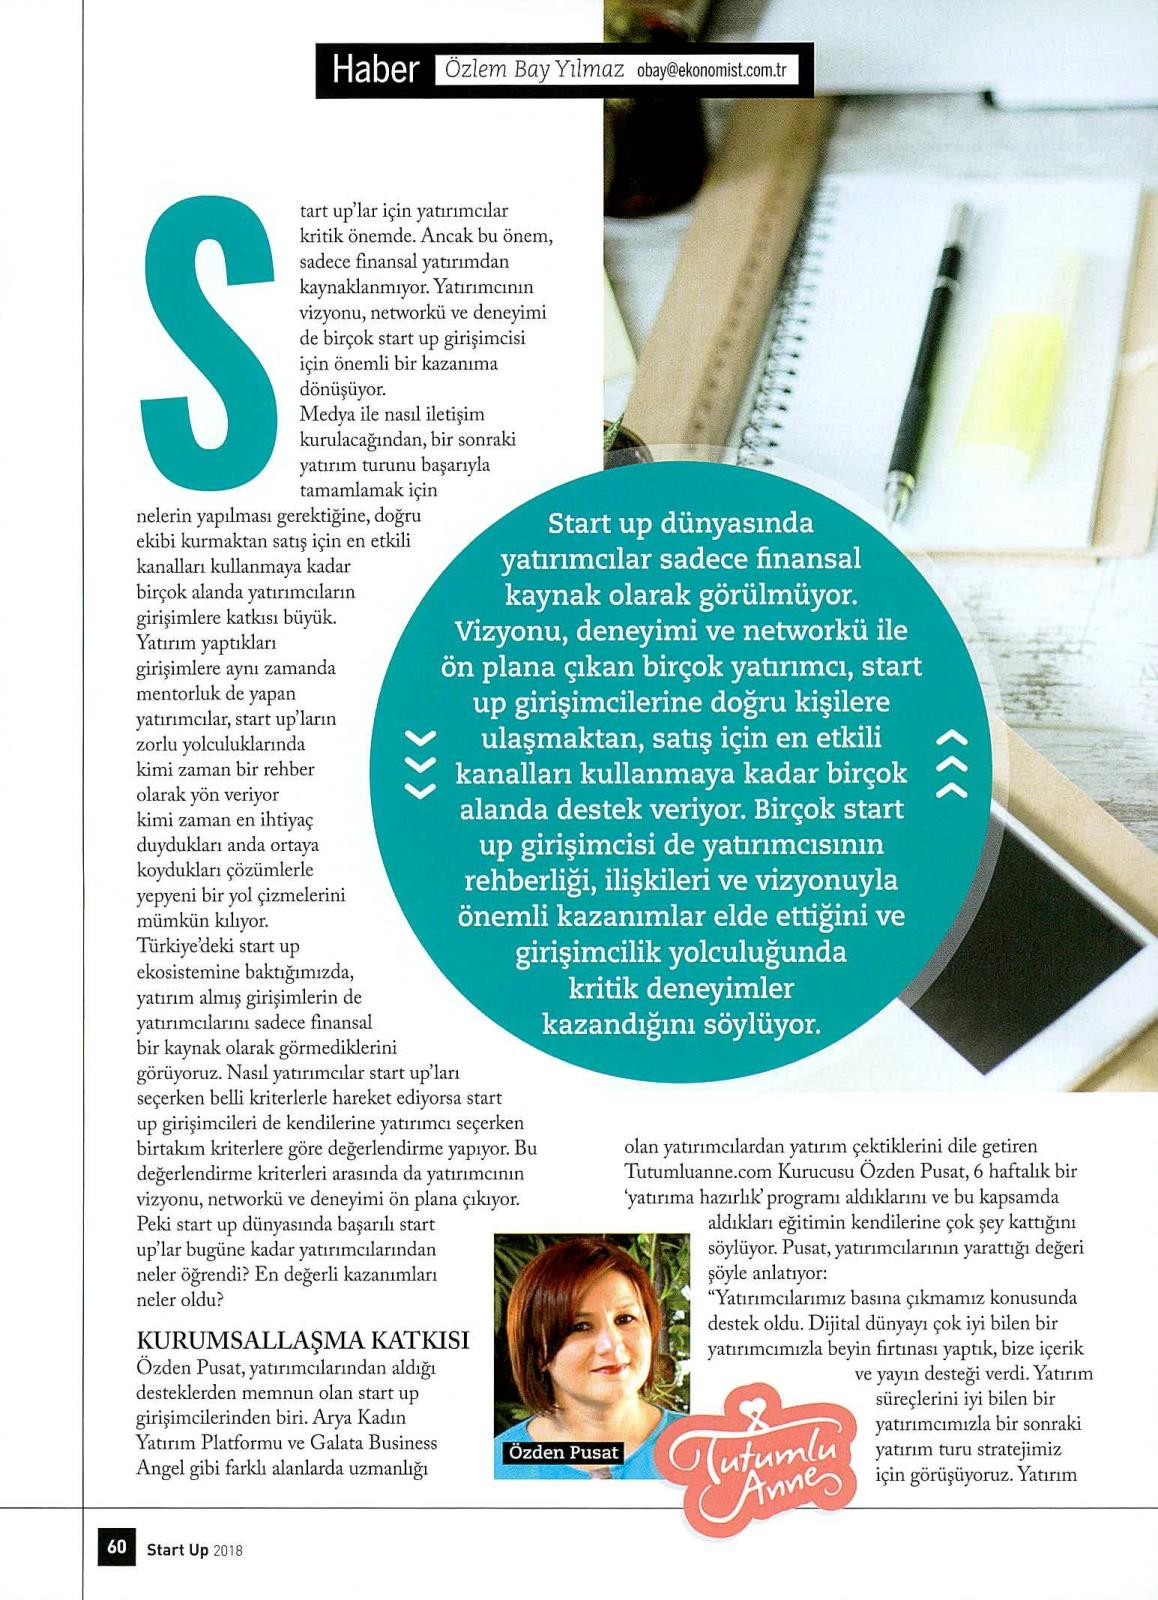 Capital_Start Up Dergisi_Kasım 2018_1